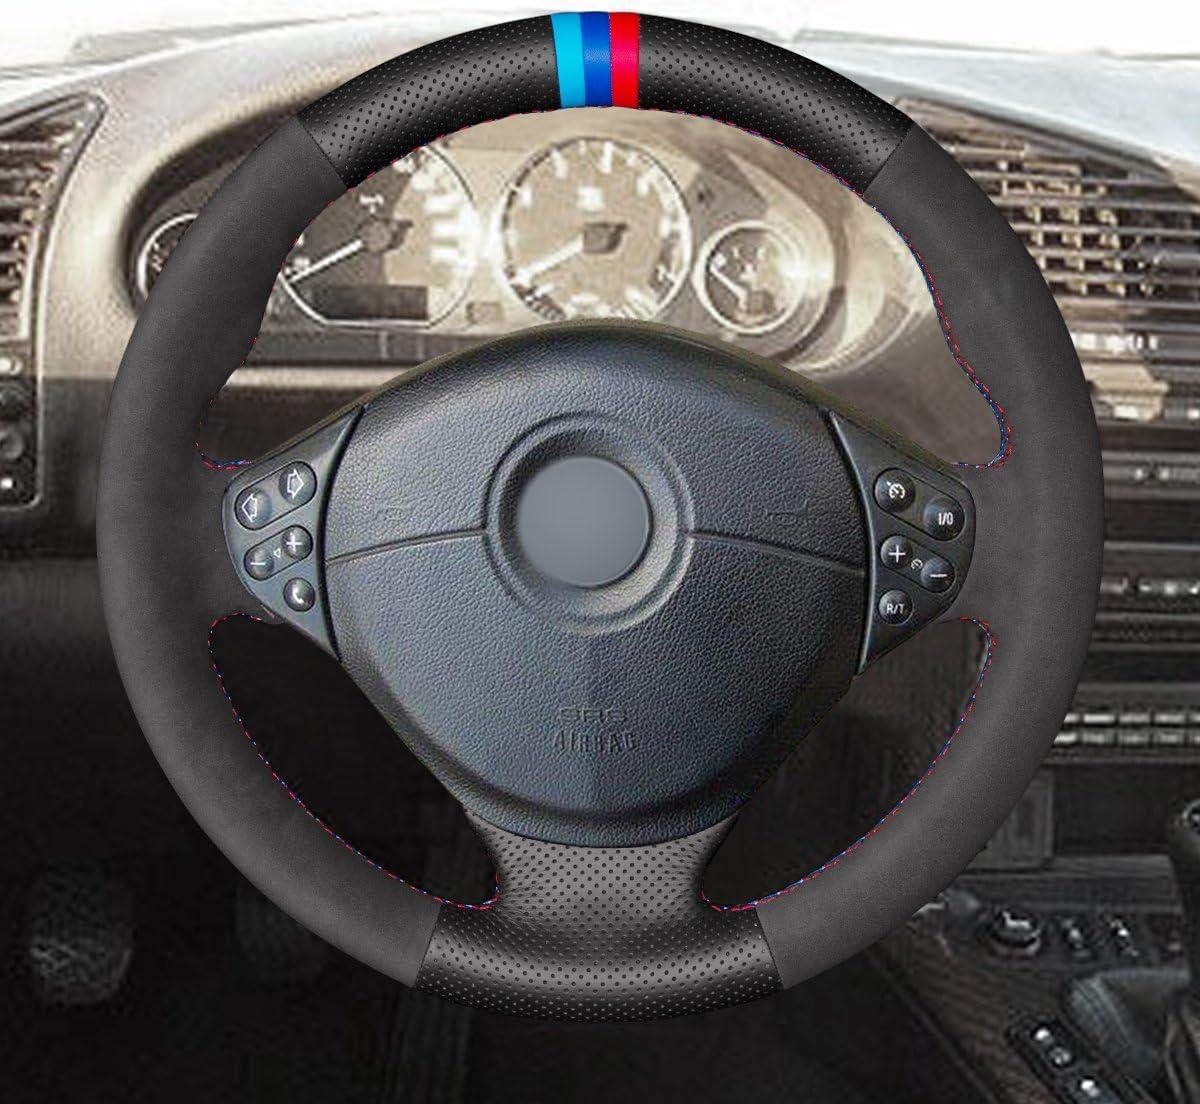 20 2005/E53/X 5/2000 DIY Individuelle Hand n/ähen Schwarz Wildleder Schwarz Echtes Leder Auto Lenkradbezug f/ür E39/5/Series 1999 2006/E36/Z3/1996 2003/E46/3/Series 1999